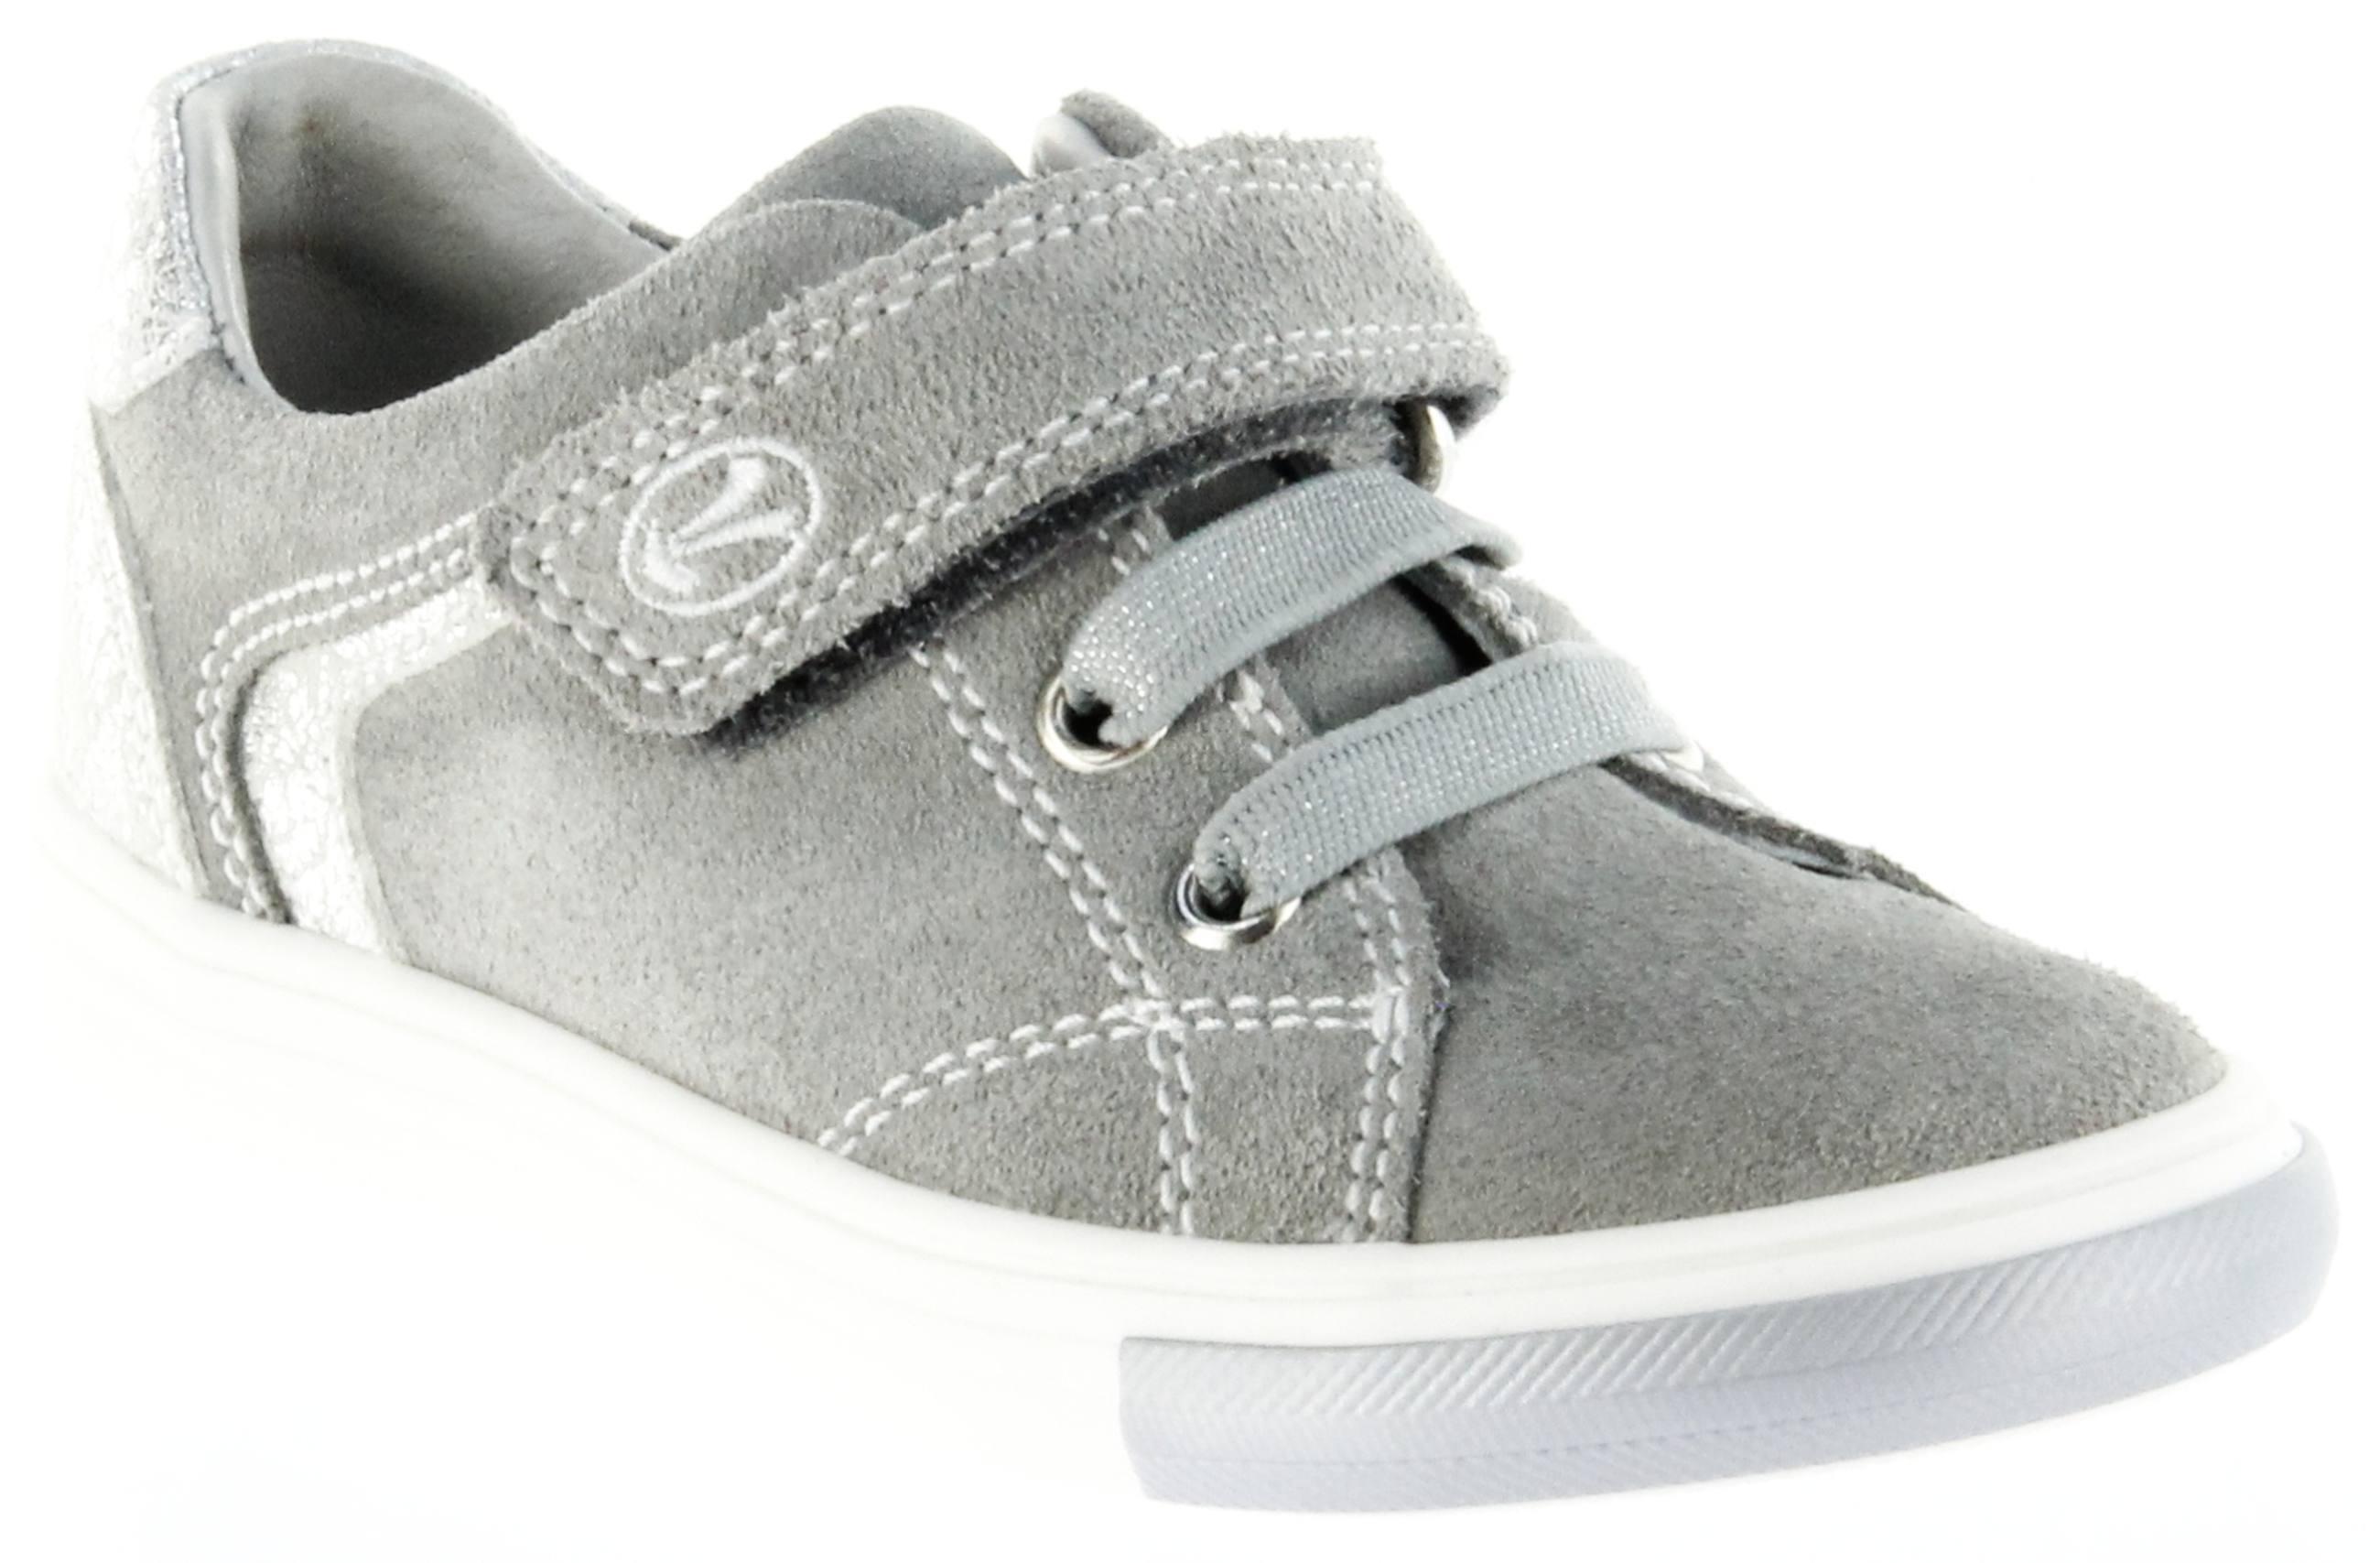 Richter Kinder Halbschuhe Sneaker grau Velourleder Mädchen